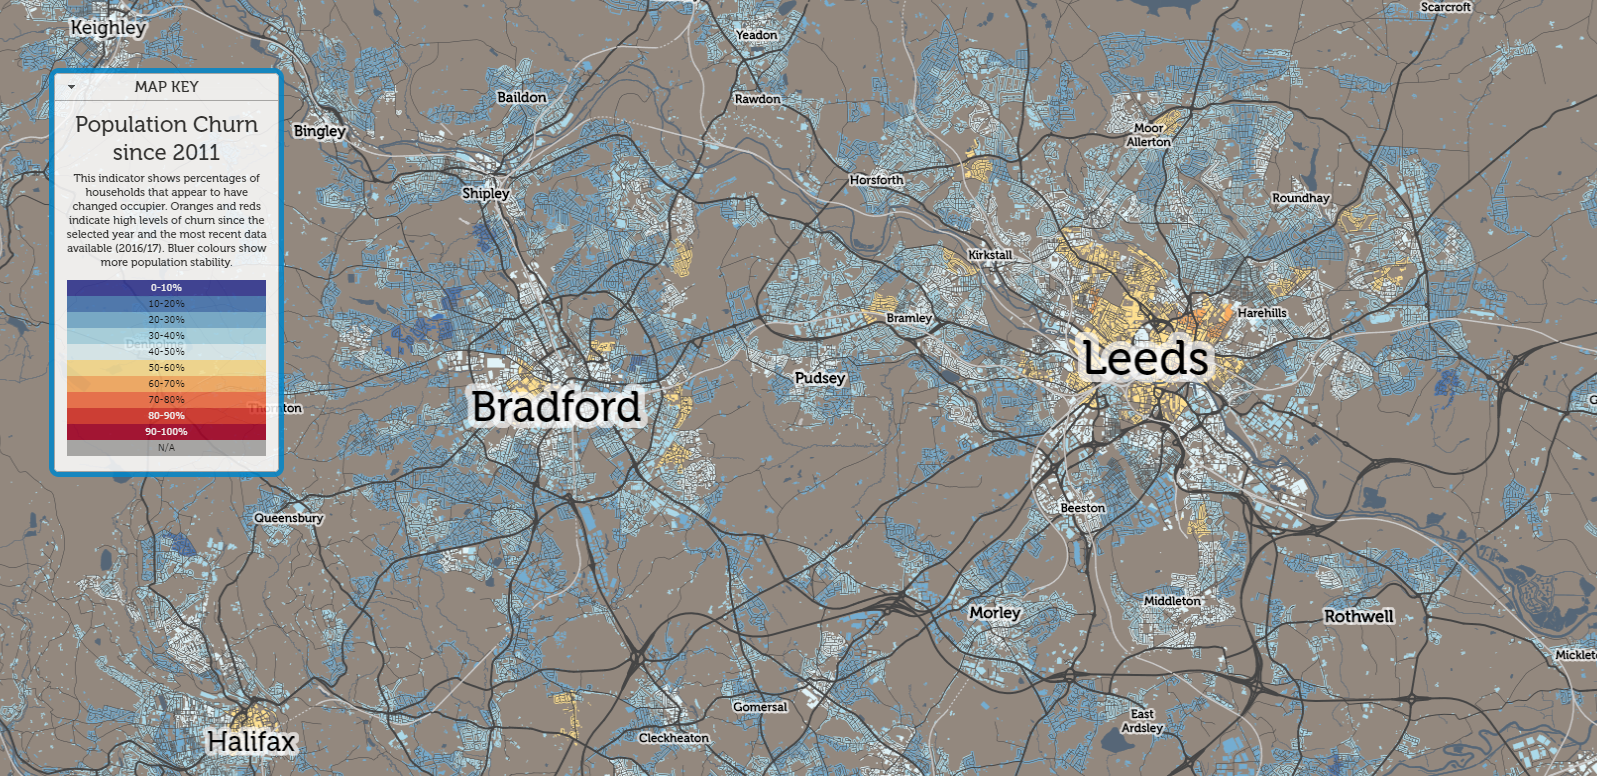 Leeds since 2011